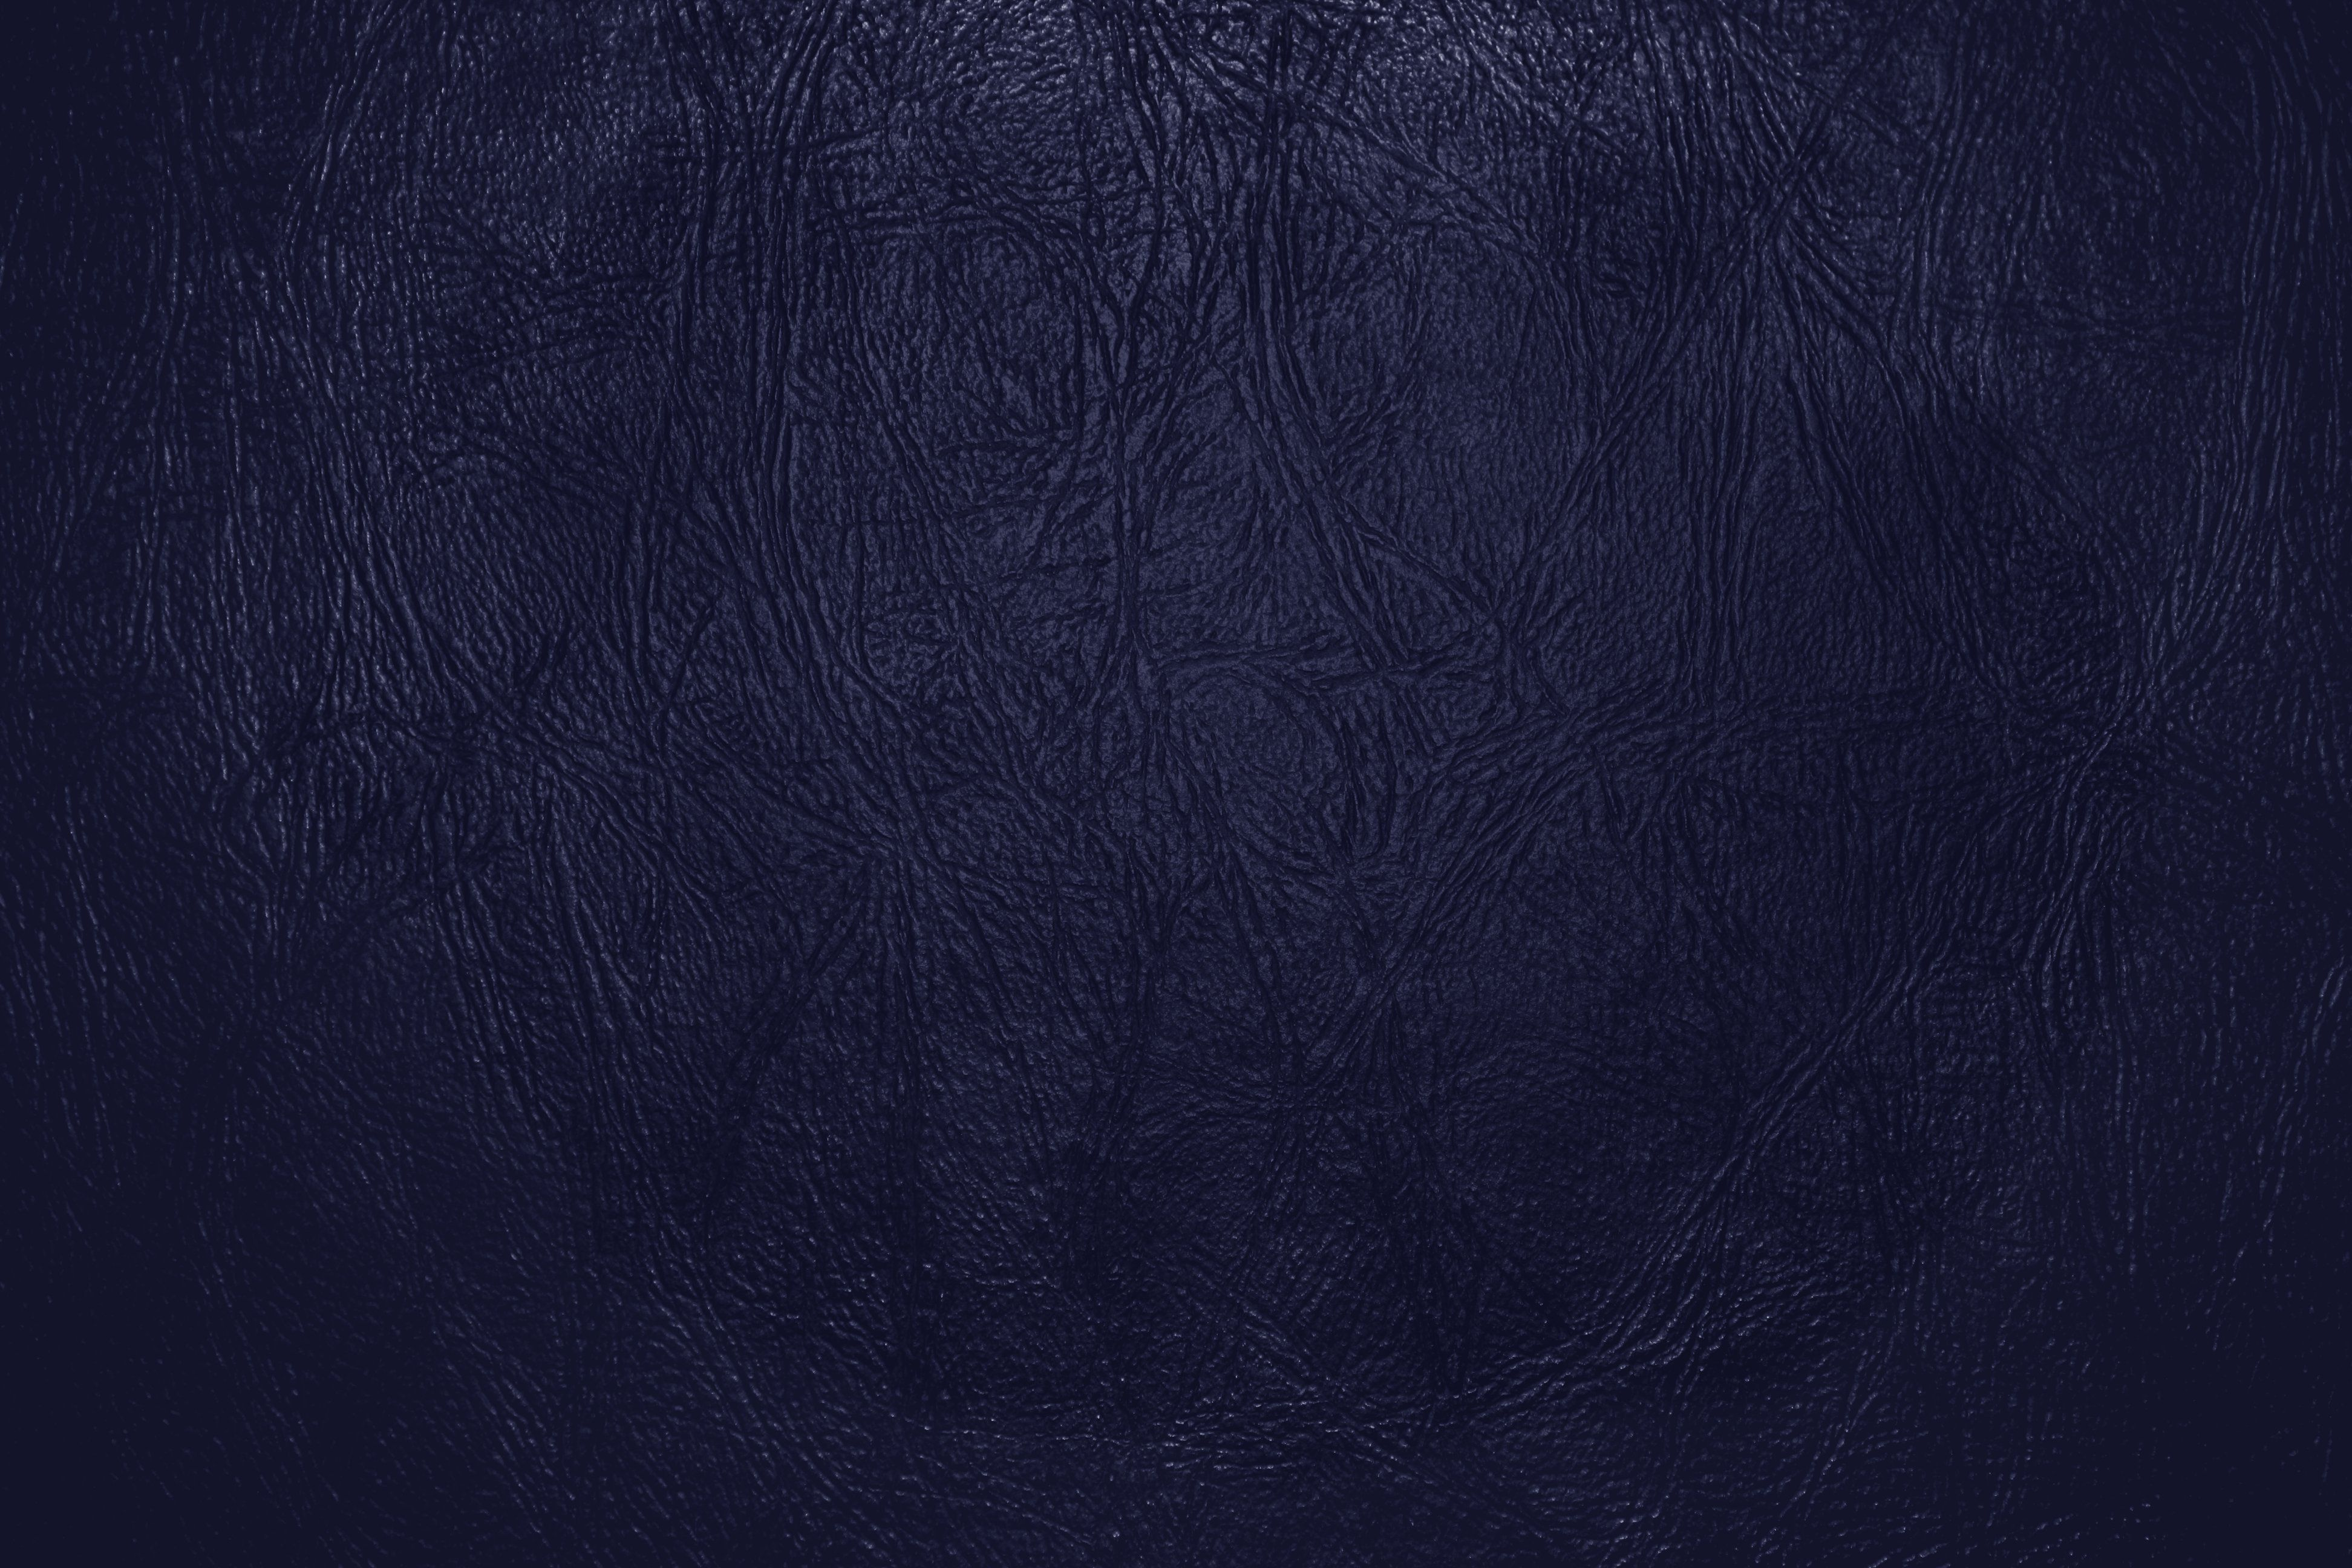 Close Up Of Texture Dark Blue Wallpaper Blue Texture Background Blue Texture